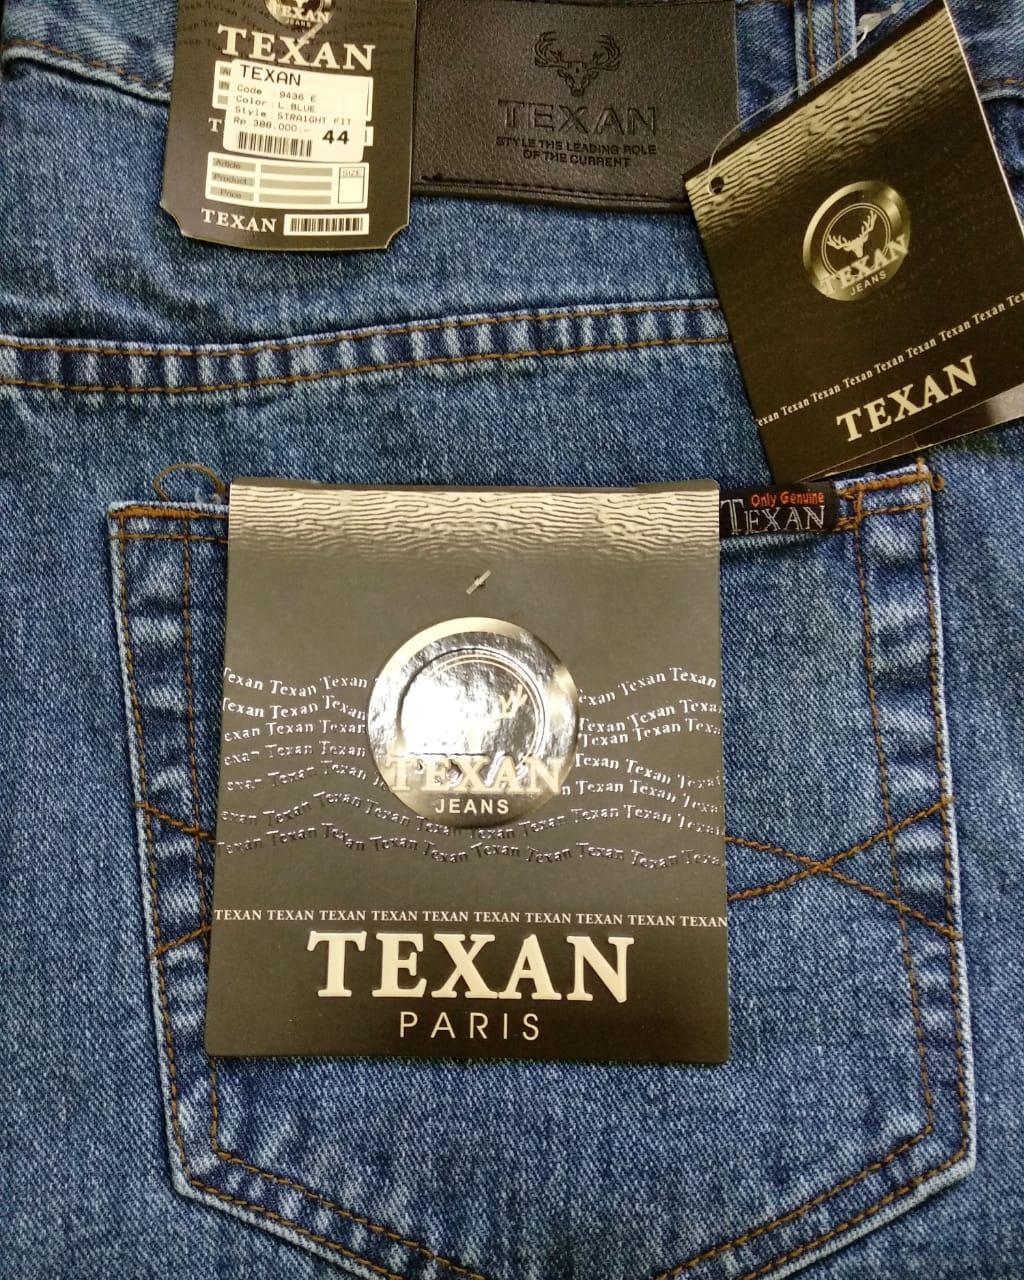 Toko Sumber Rejeki Jeans - Celana Jeans Jumbo Panjang Pria Big Size 40 41 42 43